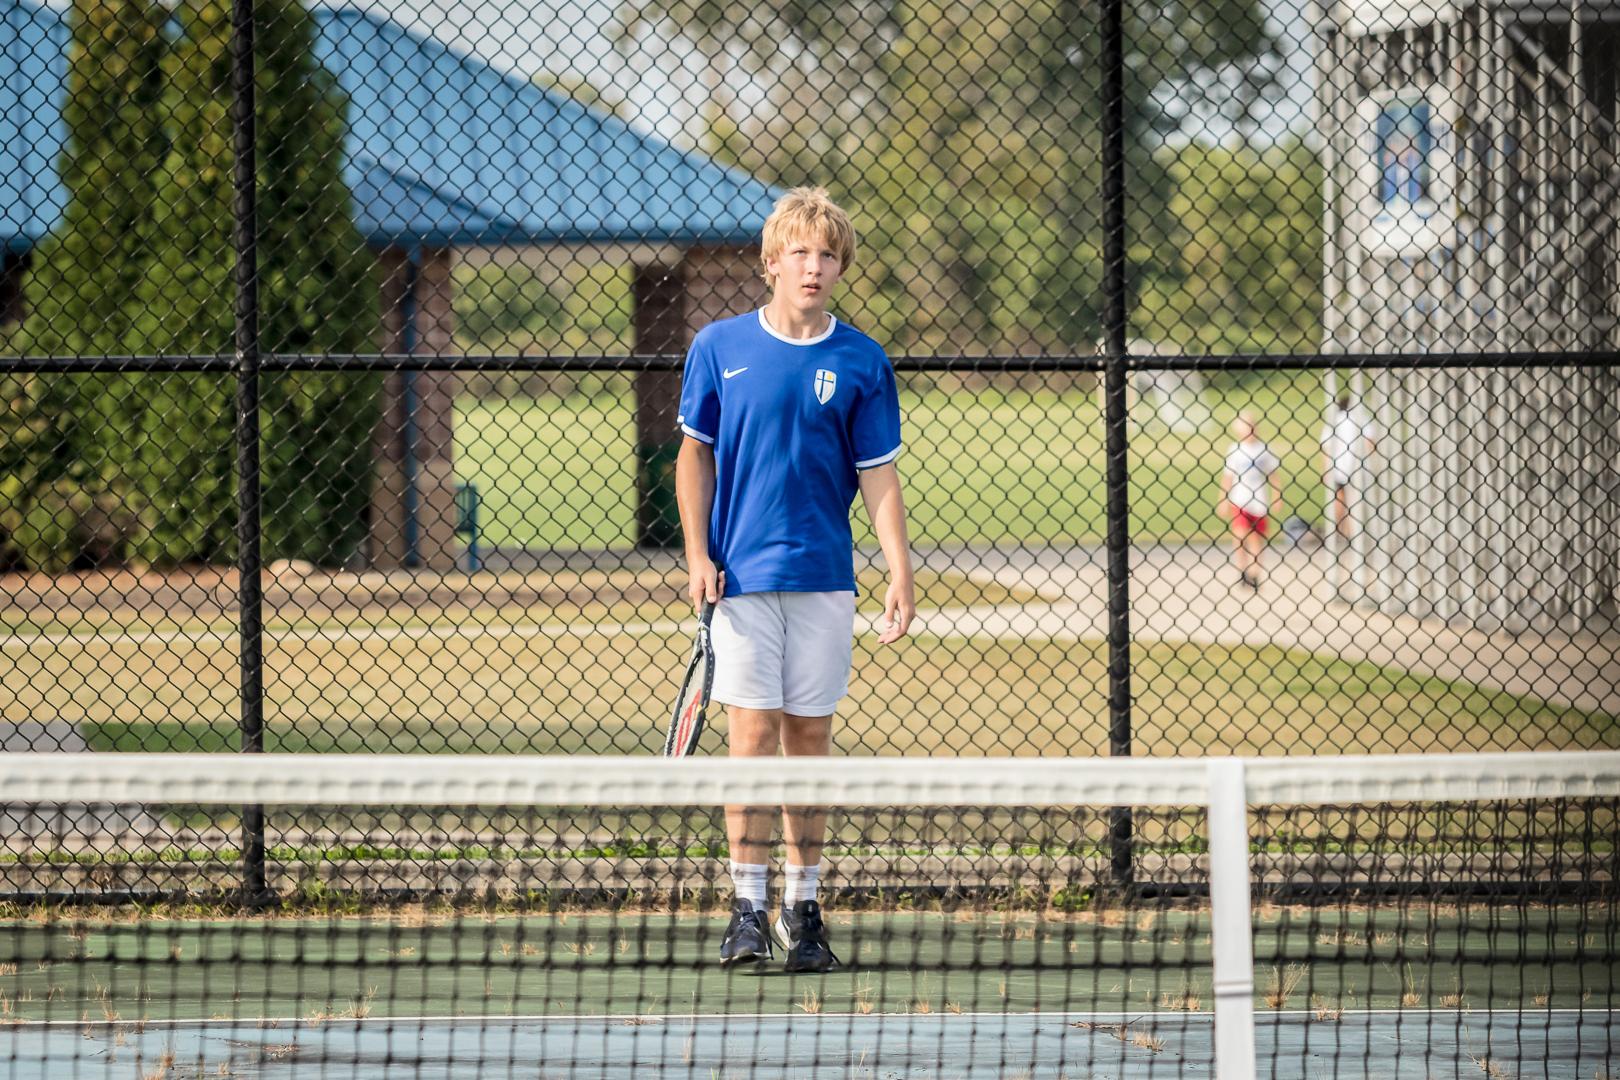 Marian-Boys-Tennis-1643.jpg